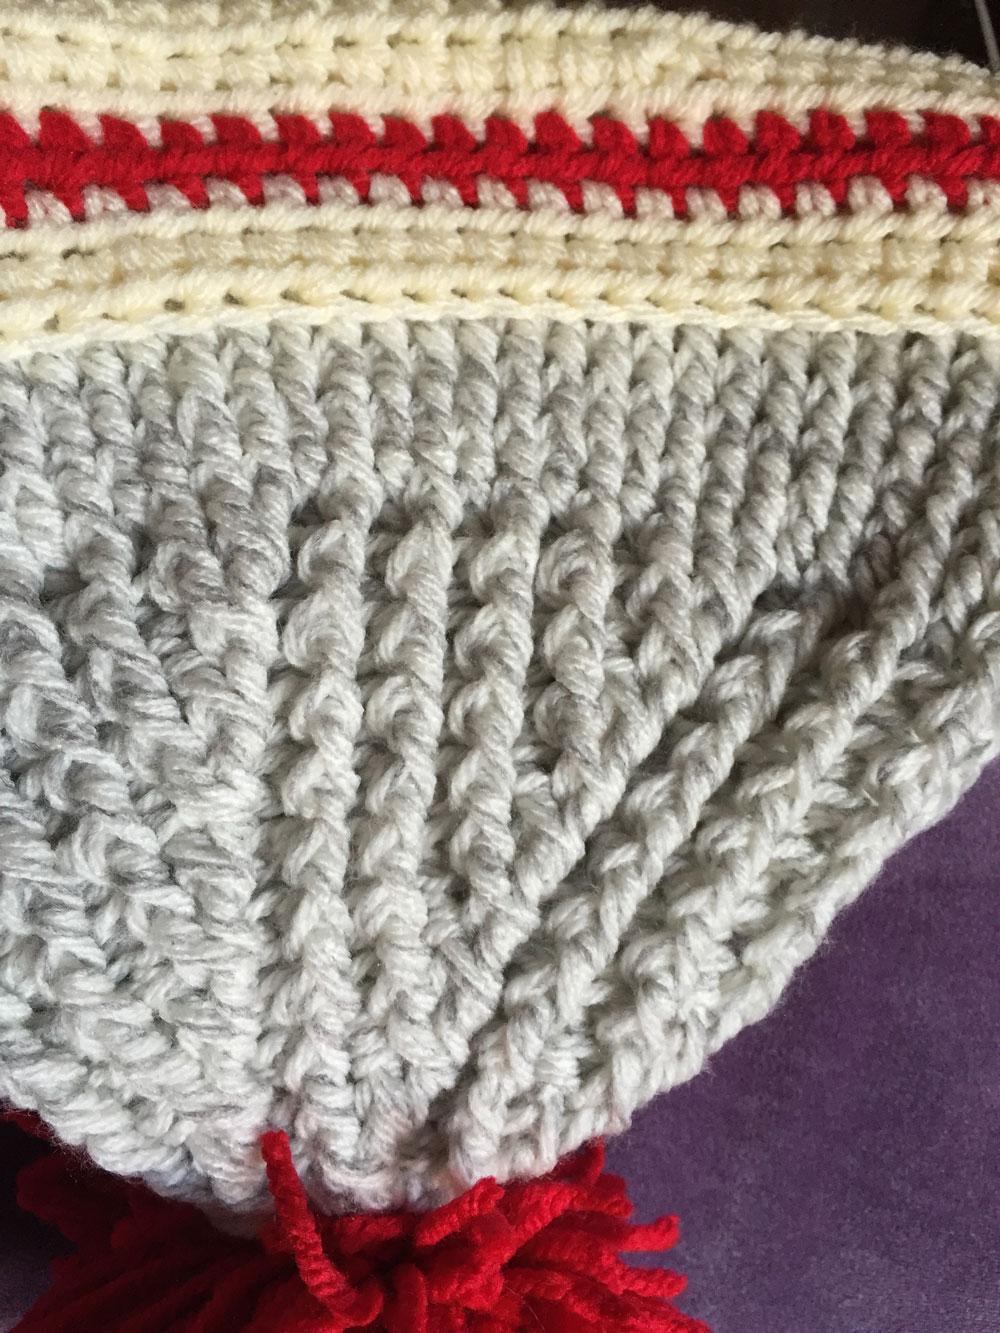 Crochet Sock Hats - All Sizes + Tutorial - The Crochet Crowd®